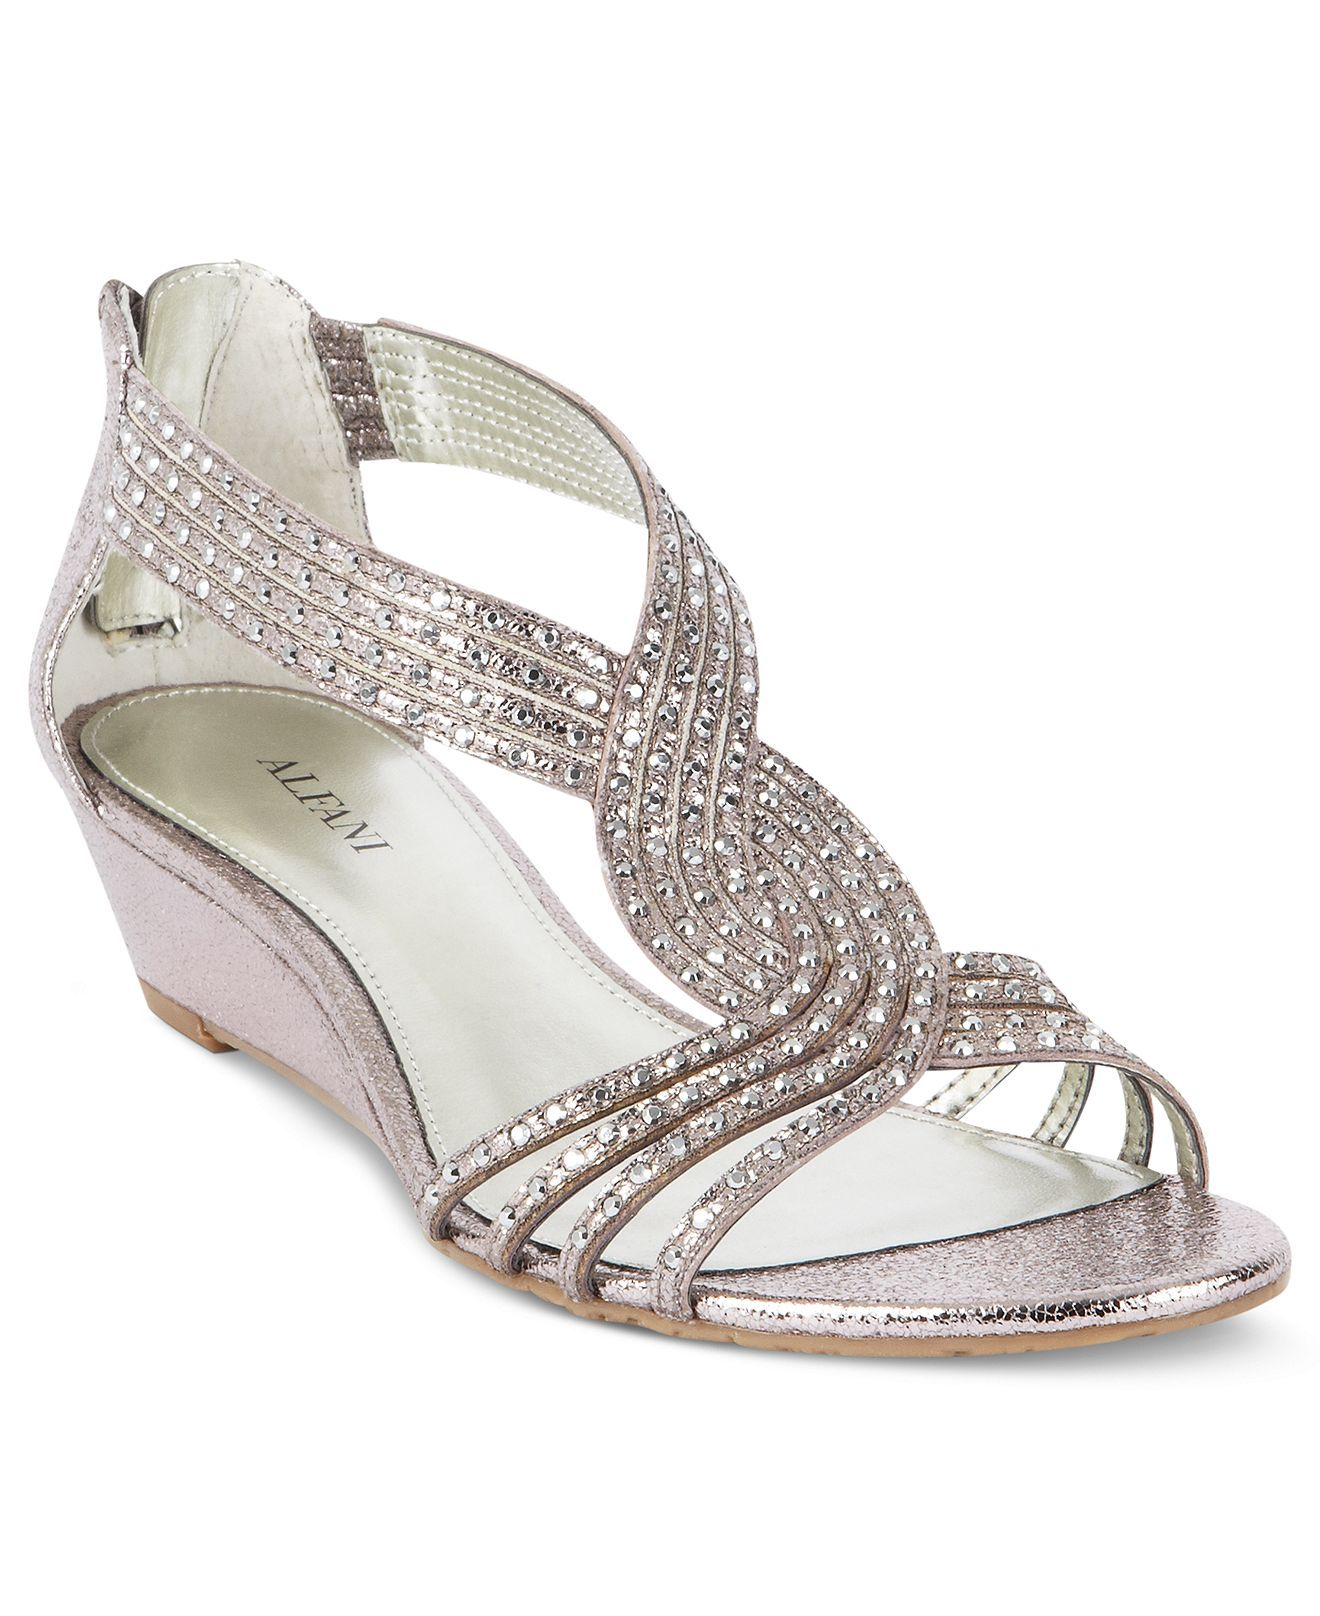 Alfani Women's Genesis Wedge Sandals - All Women's Shoes - Shoes - Macy's. Calzado  MujerSandaliasModa ...